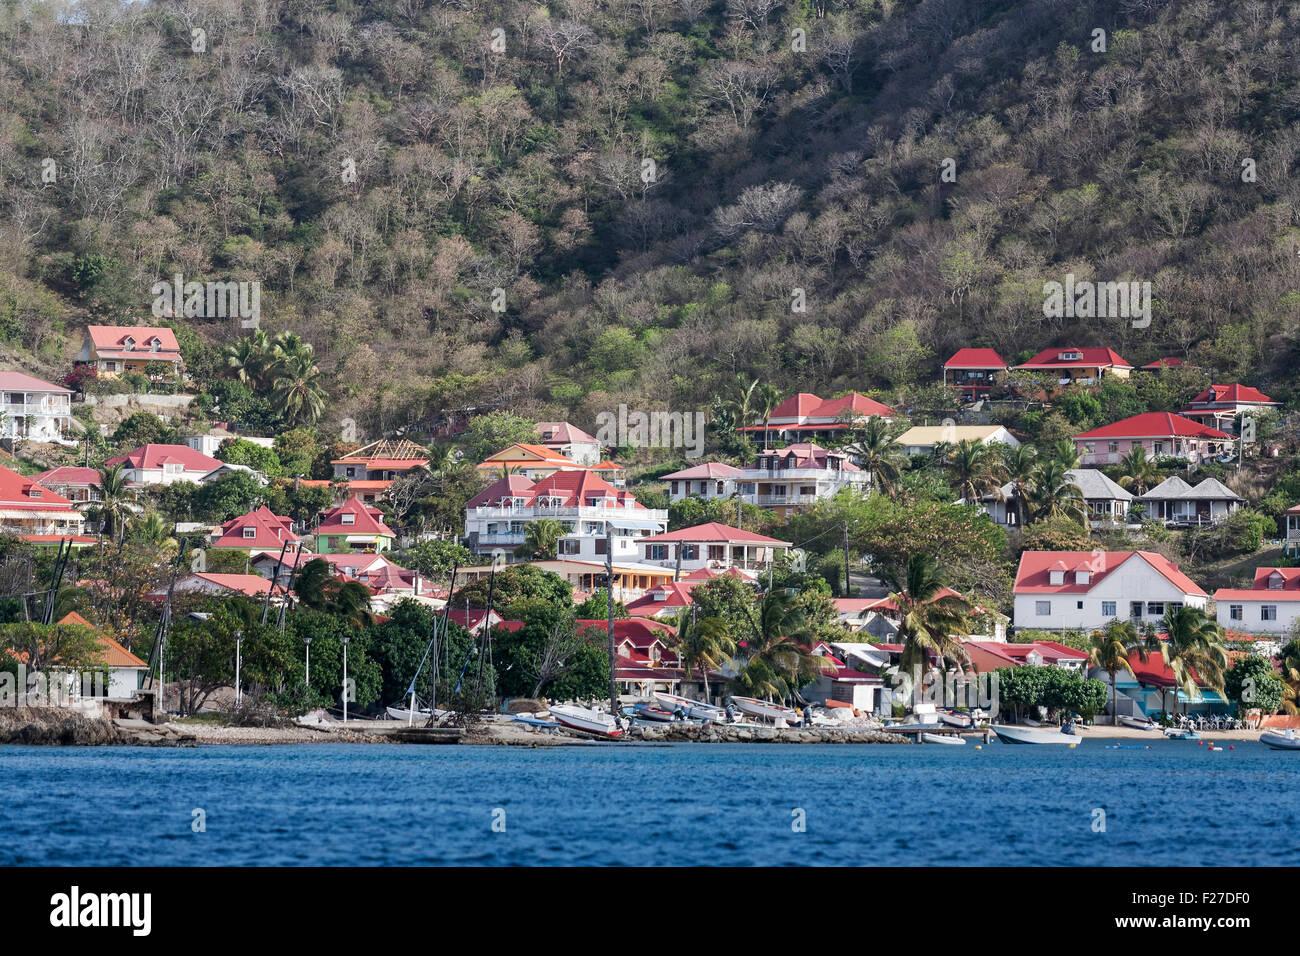 Les Saintes AKA: Îles des Saintes, Guadeloupe, French Antilles, Caribbean Stock Photo